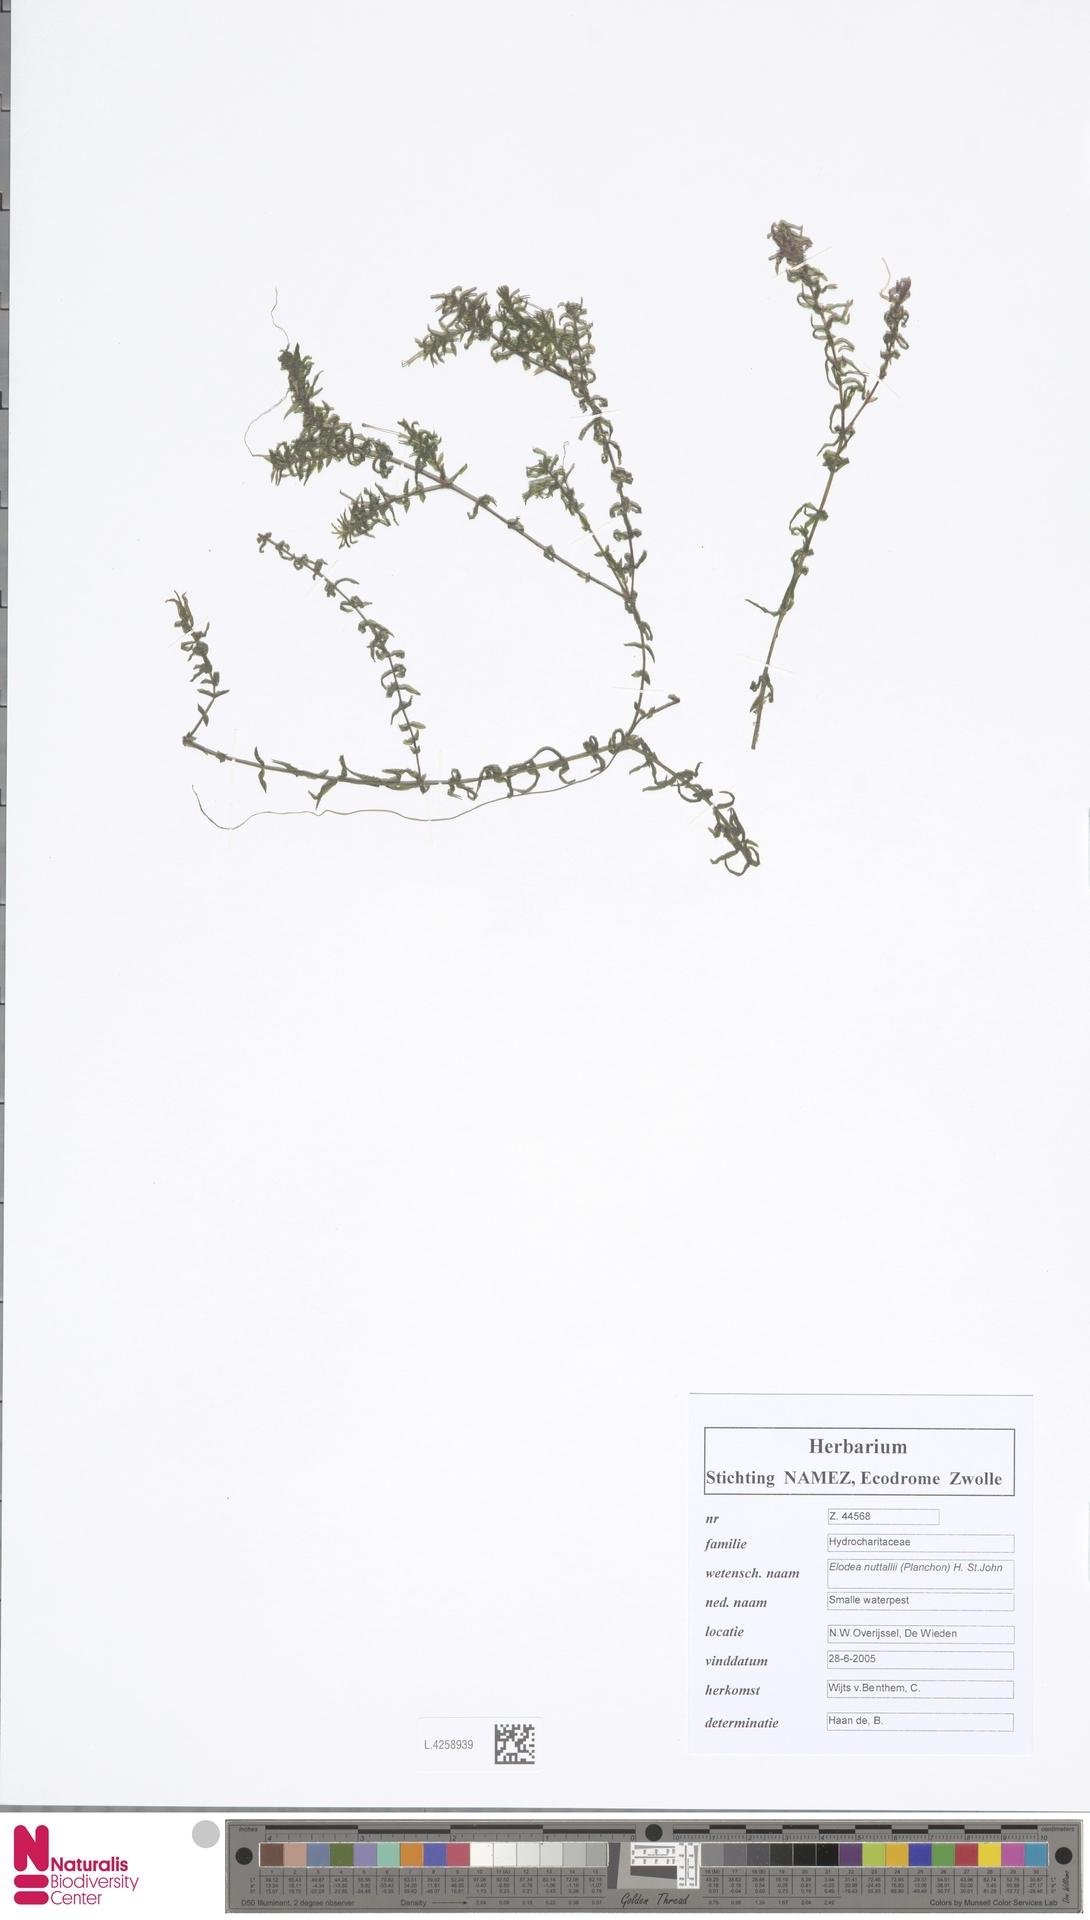 L.4258939 | Elodea nuttallii (Planch.) H.St.John